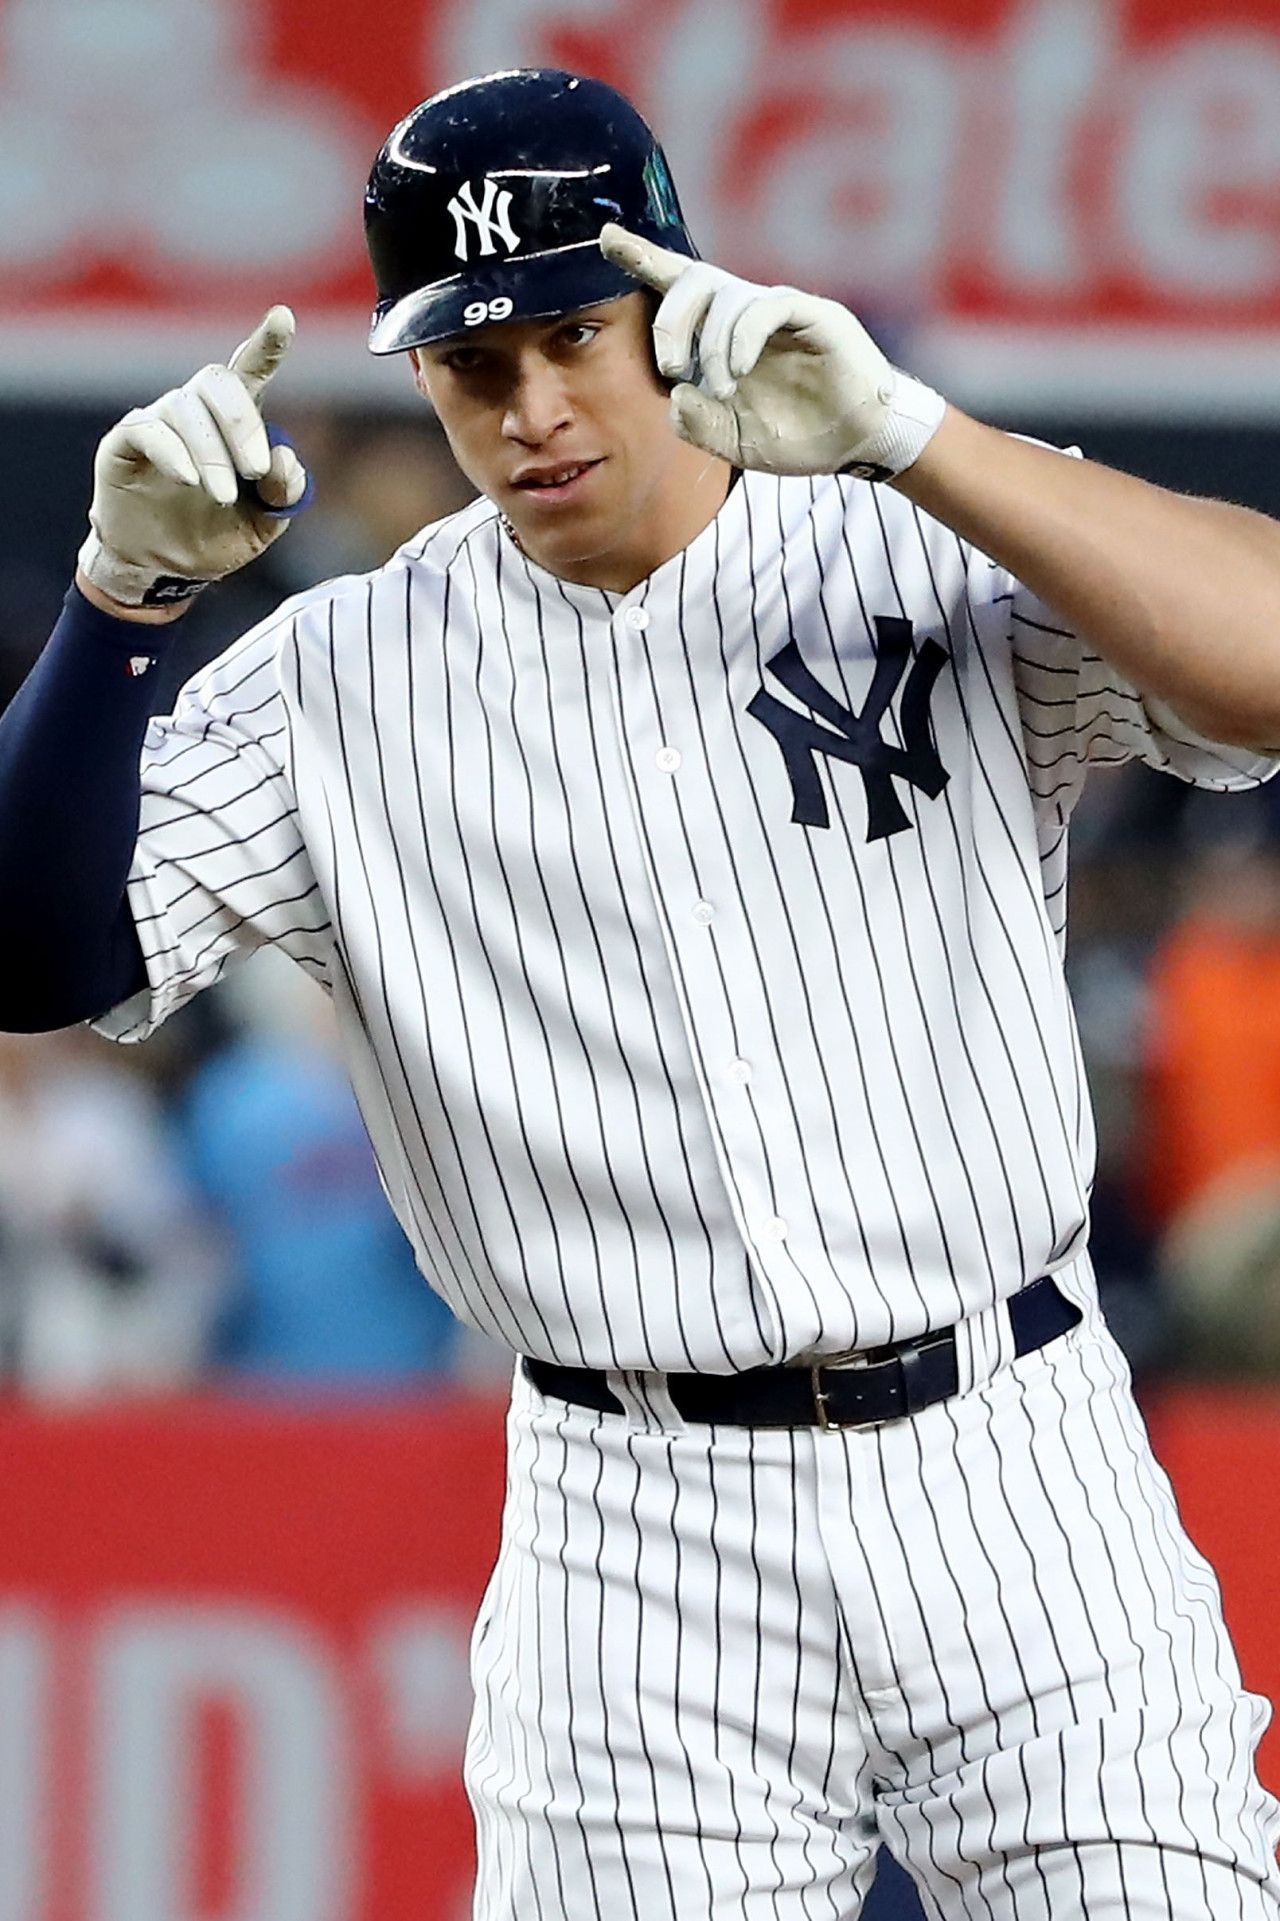 Yankees Belt Four Home Runs In Another Twins Beatdown New York Yankees Baseball Yankees Yankees Baseball